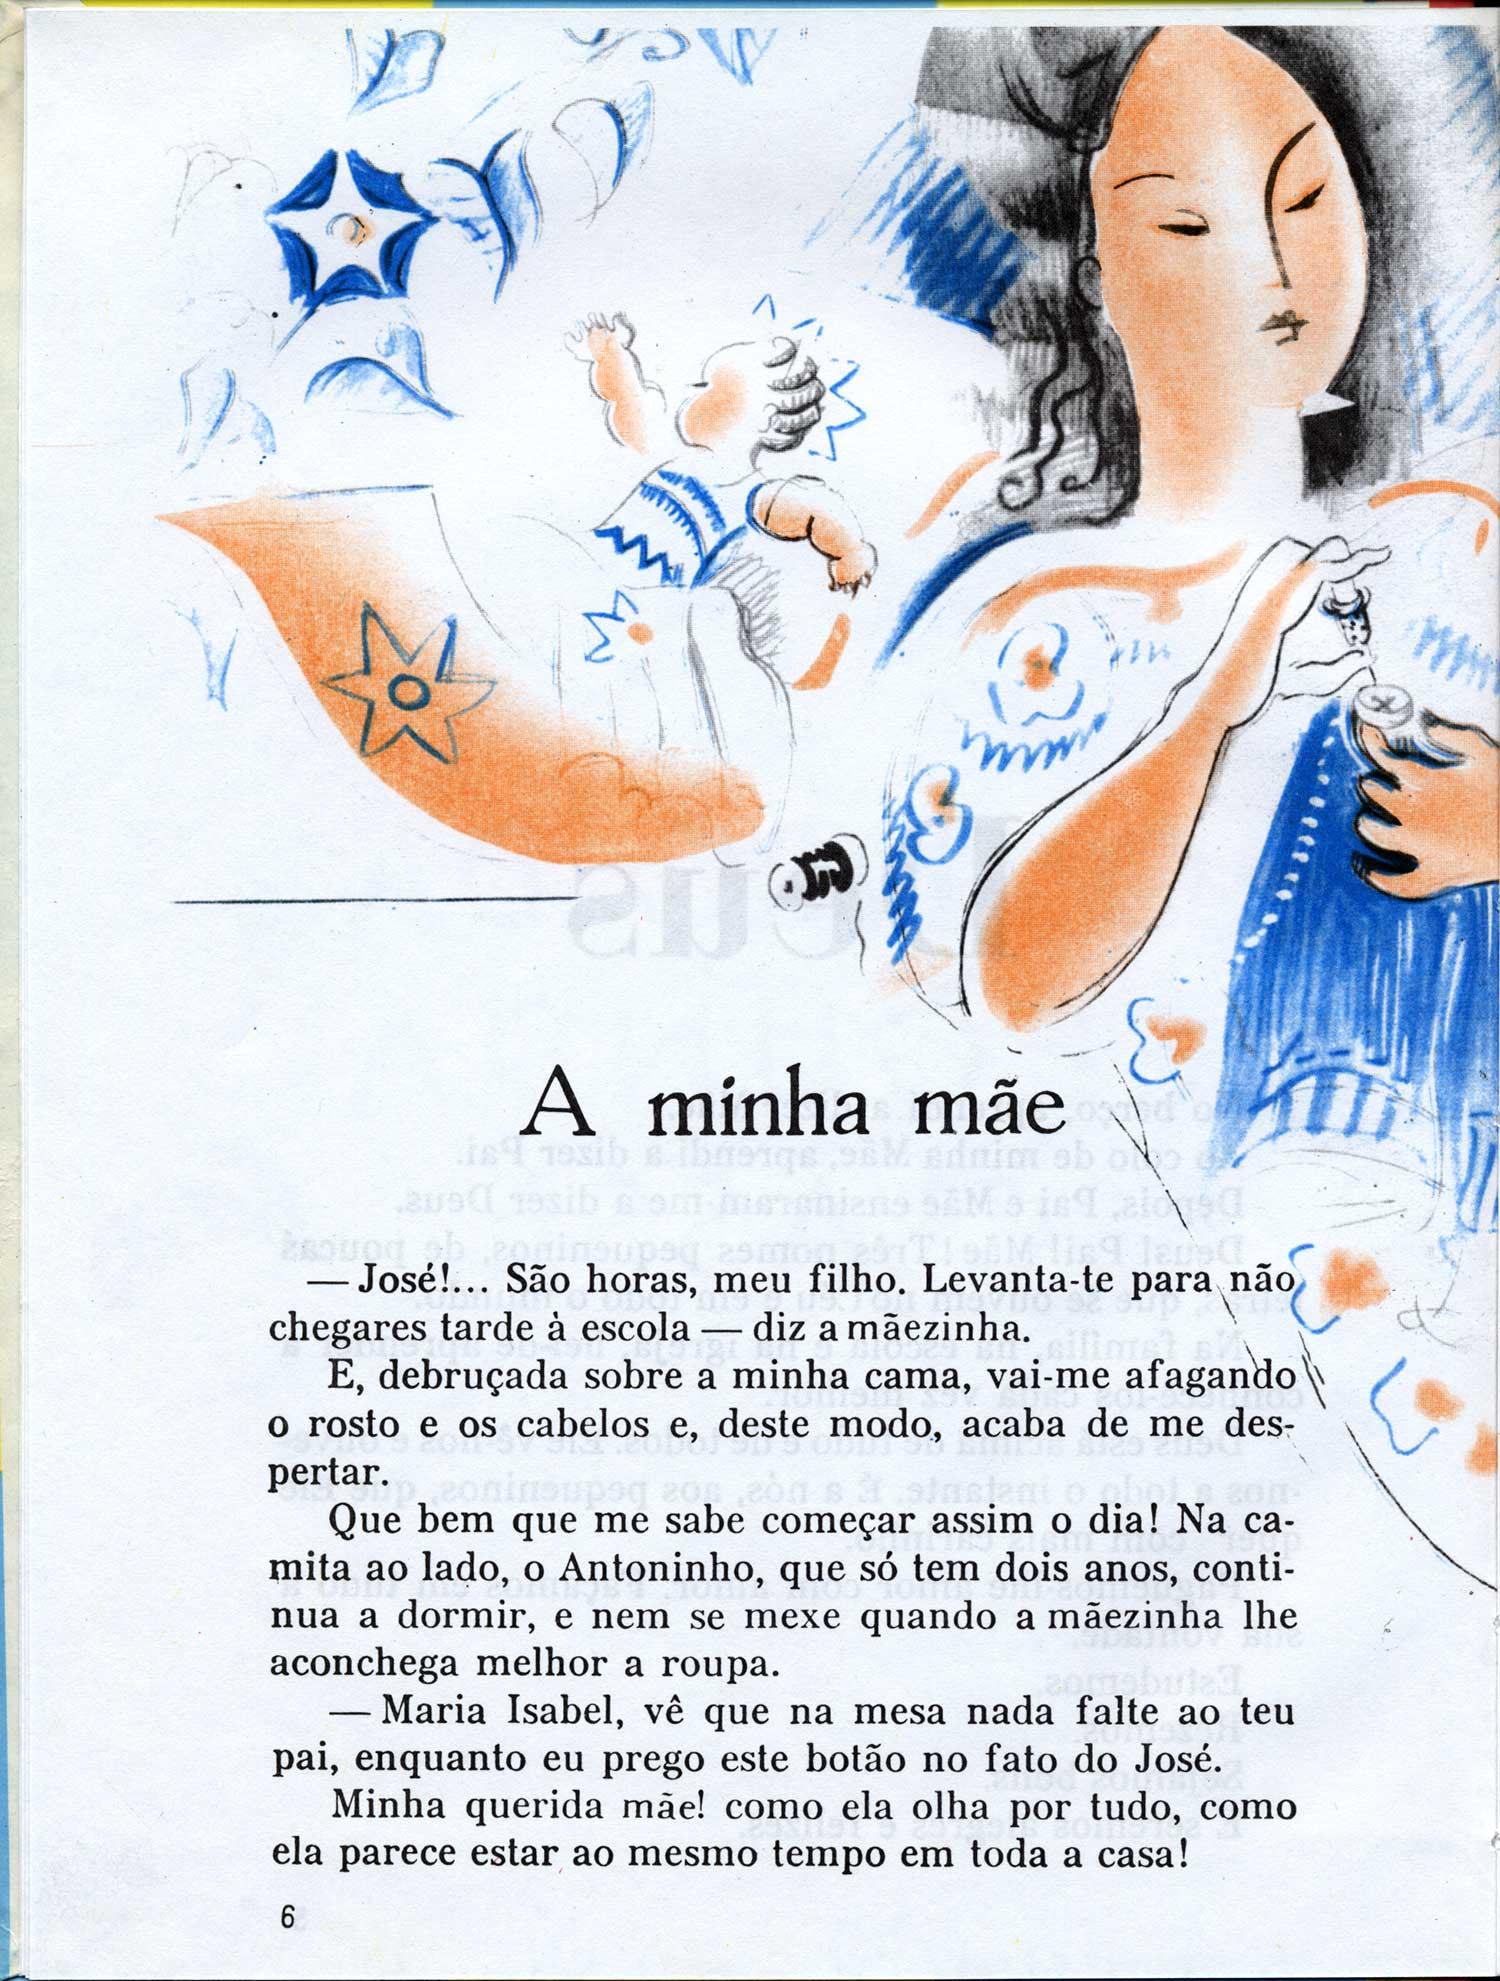 pt_textbk2_006_OLivroDaSegundaClasse_1958.jpg